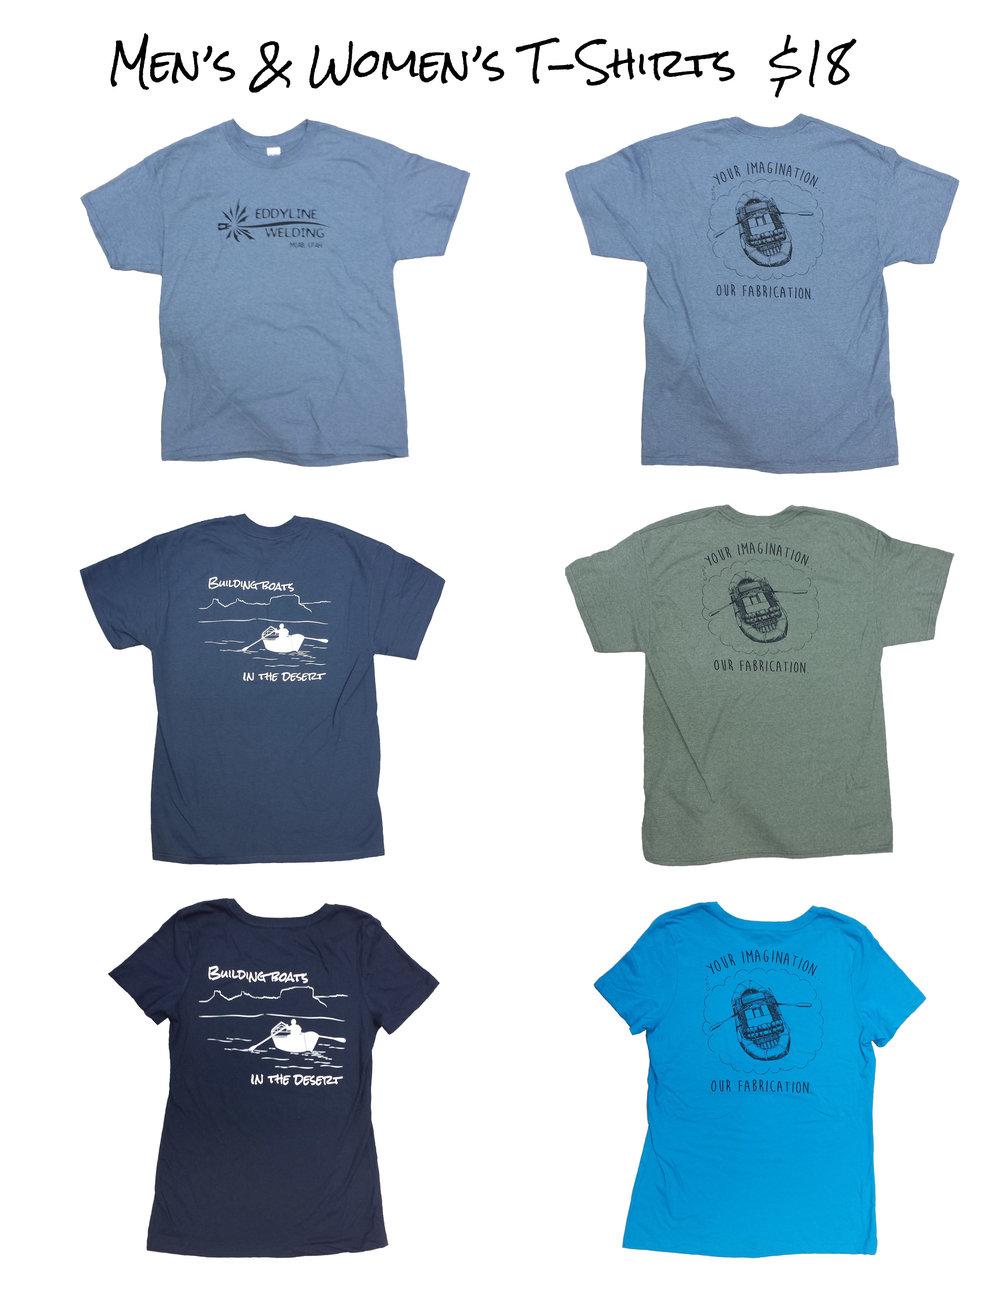 6shirts1pg.jpg